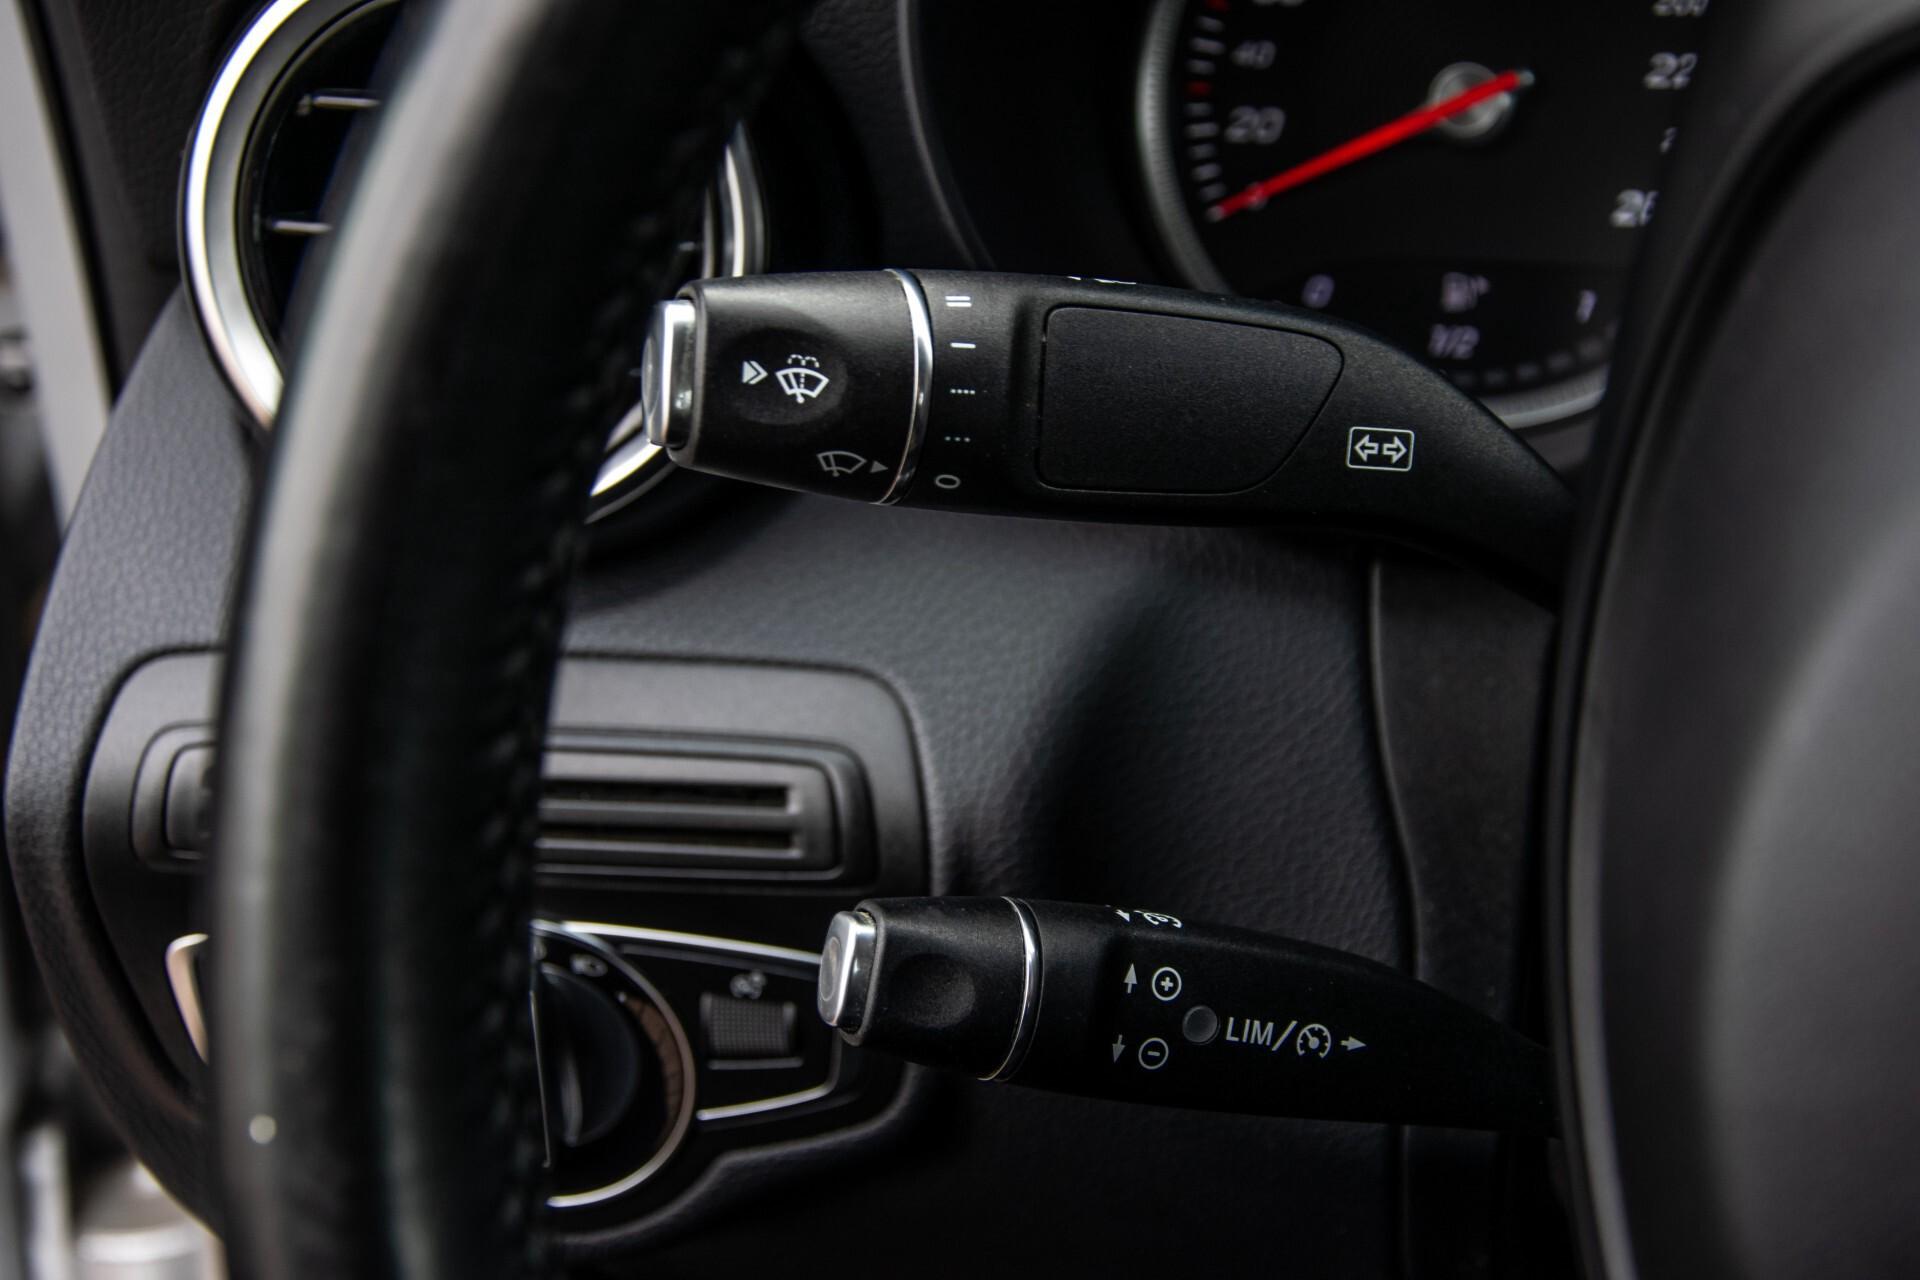 Mercedes-Benz C-Klasse 180 Bluetec Lease Edition Intelligent Light System/Cruise Control/Navi Foto 10